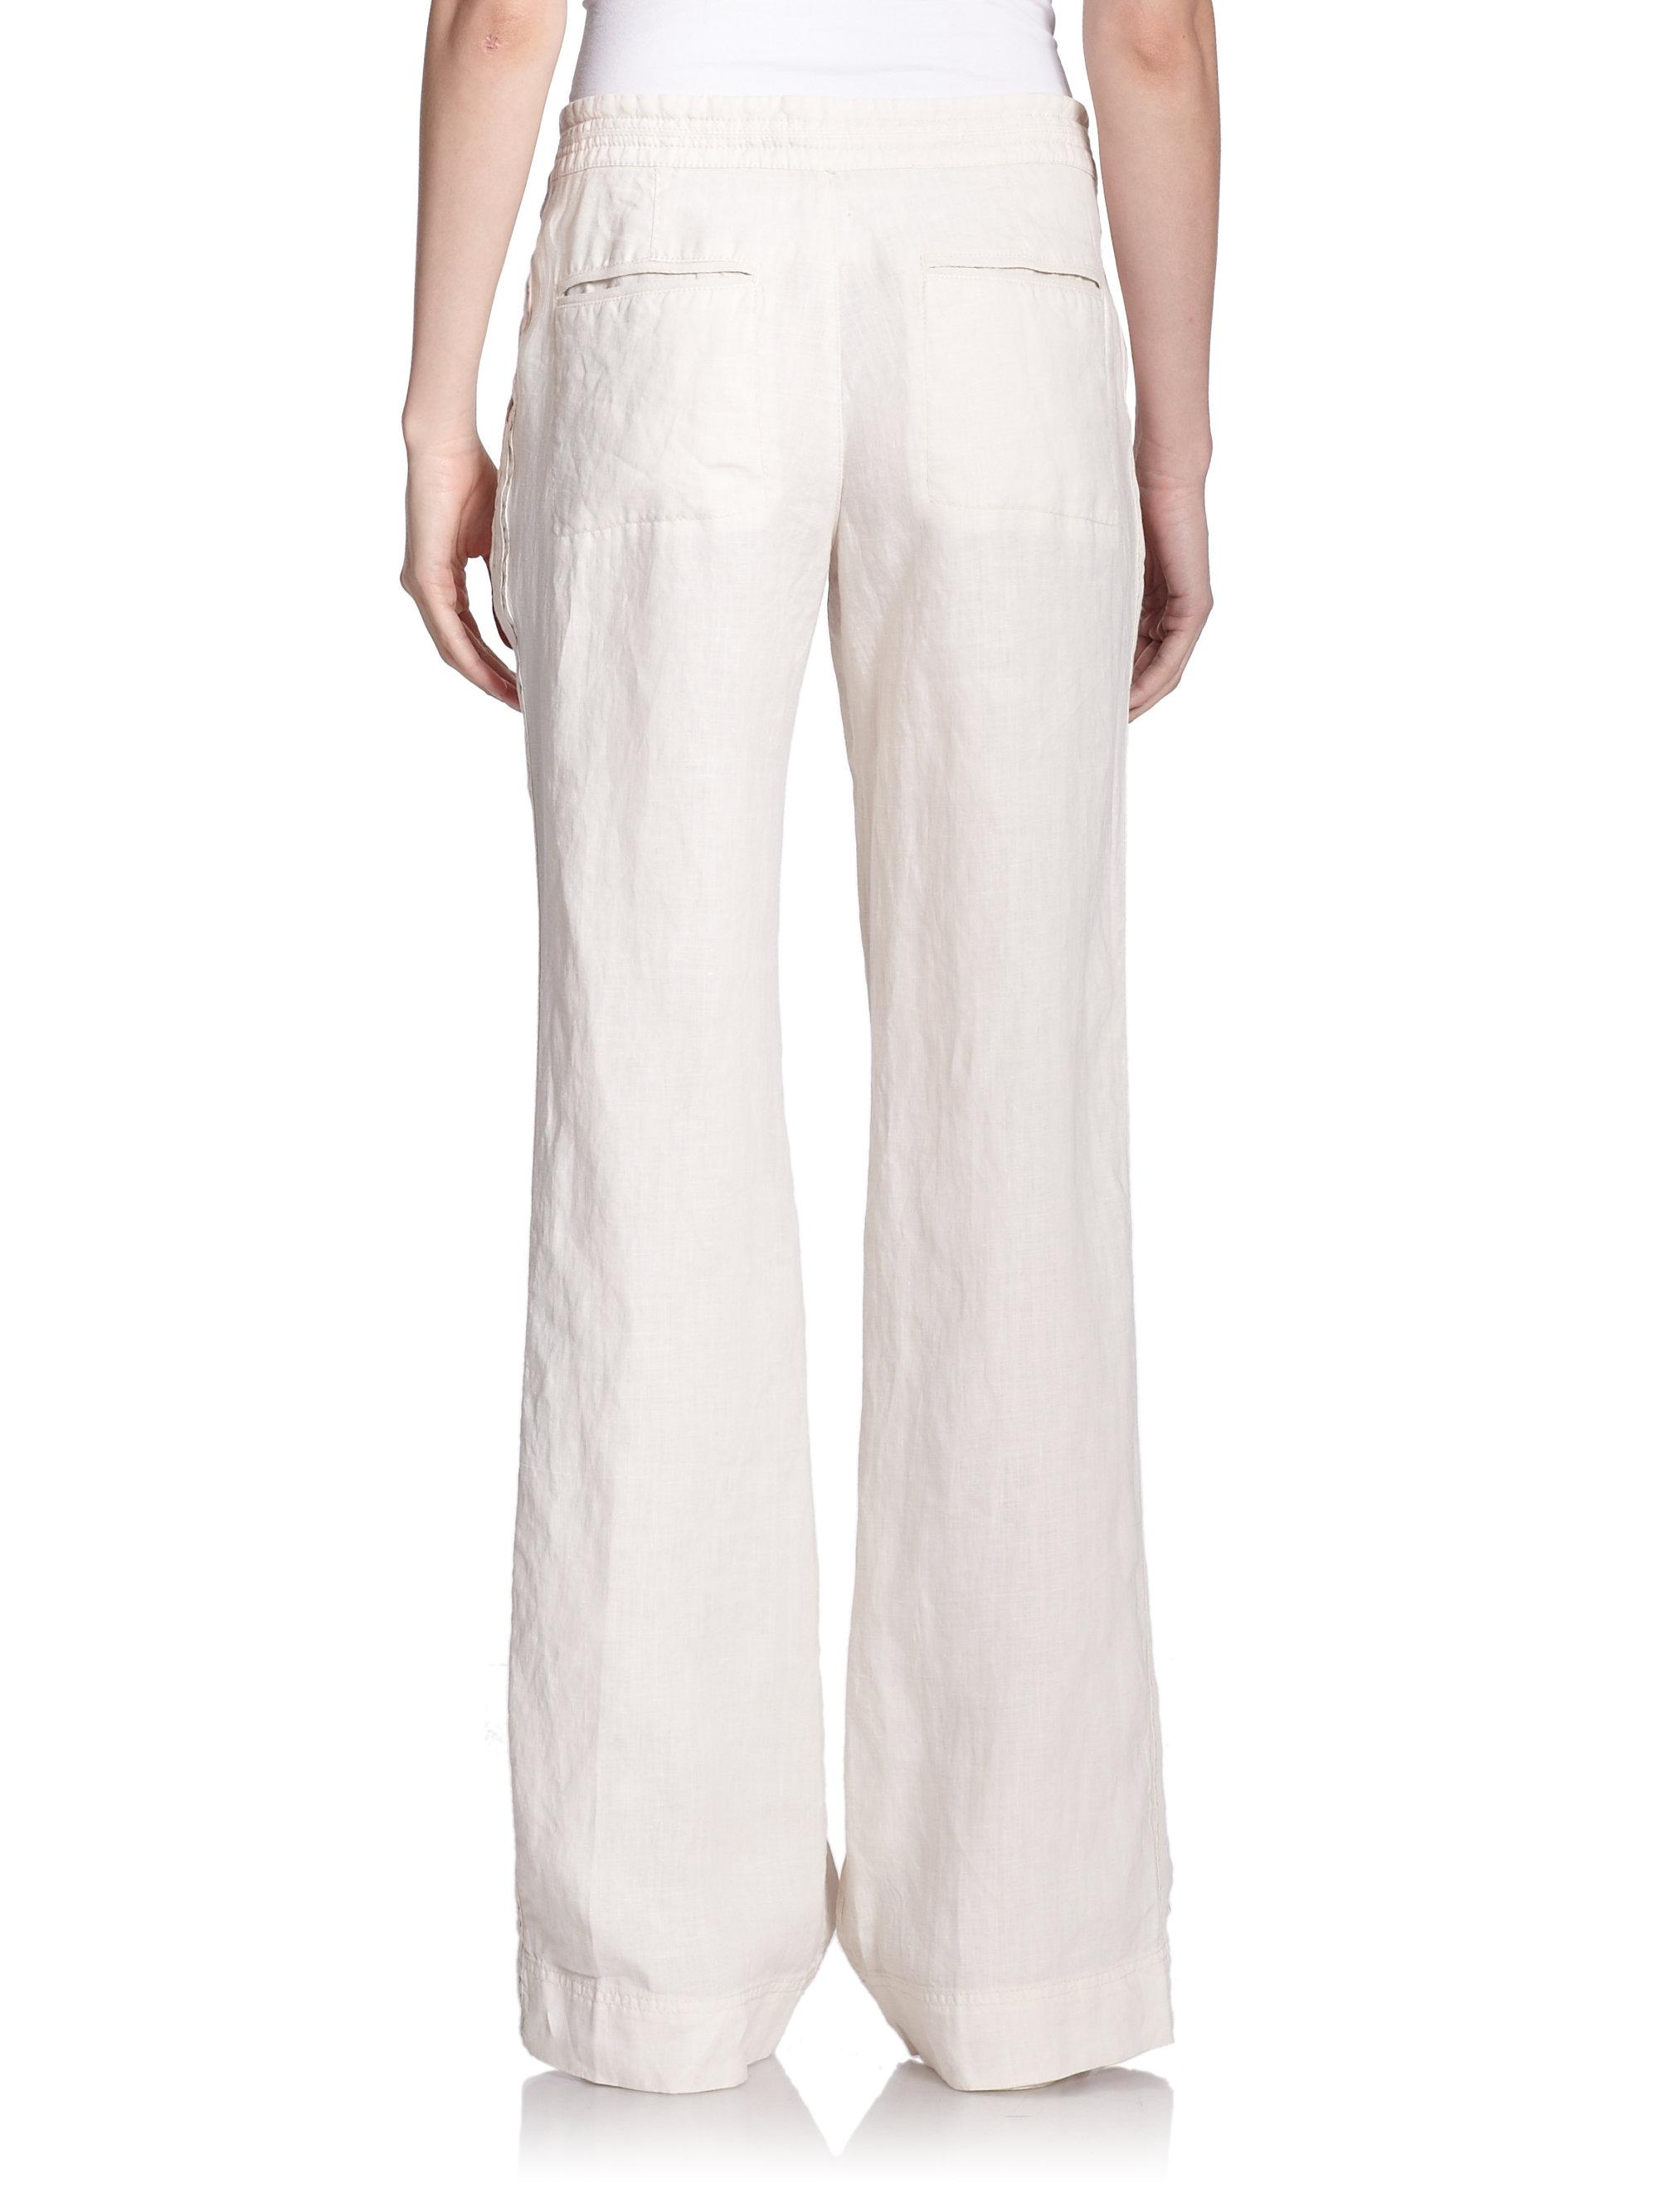 Joie Katriane Wide-leg Linen Pants in Natural | Lyst